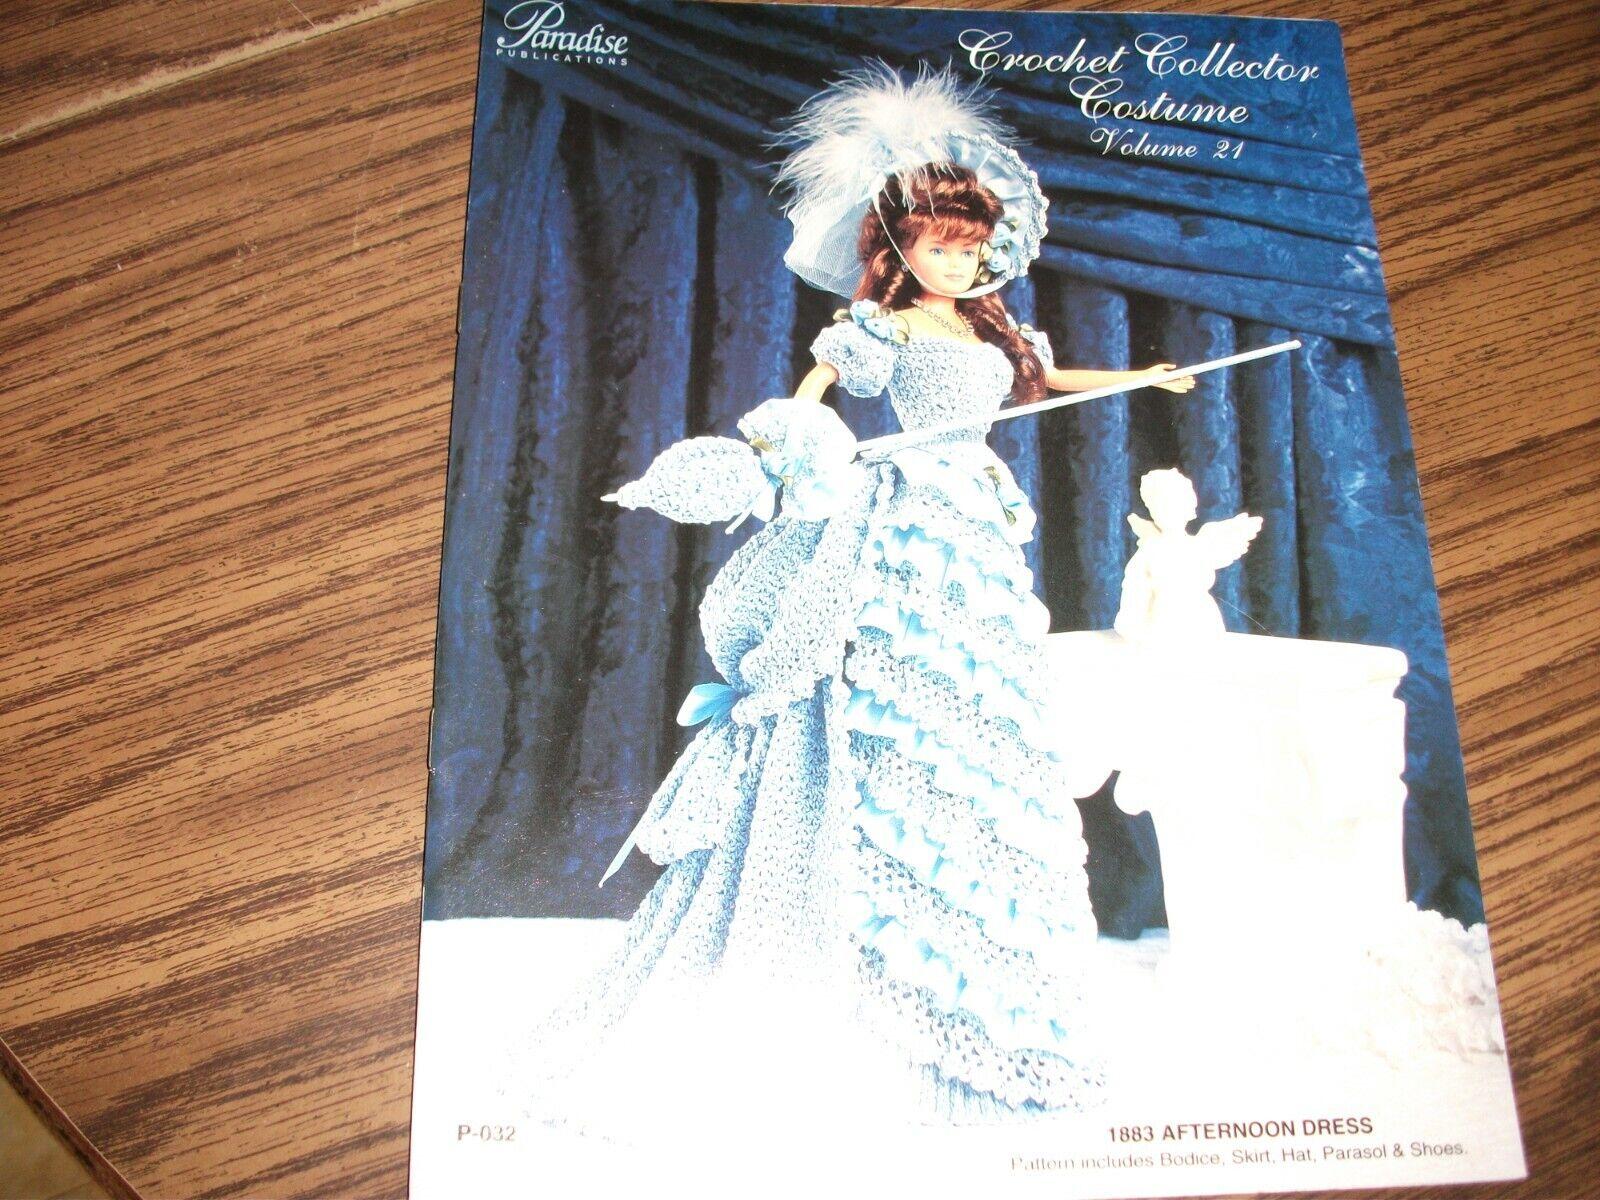 1883 Afternoon Dress for Barbie Doll Paradise Vol 21 Crochet PATTERN Leaflet